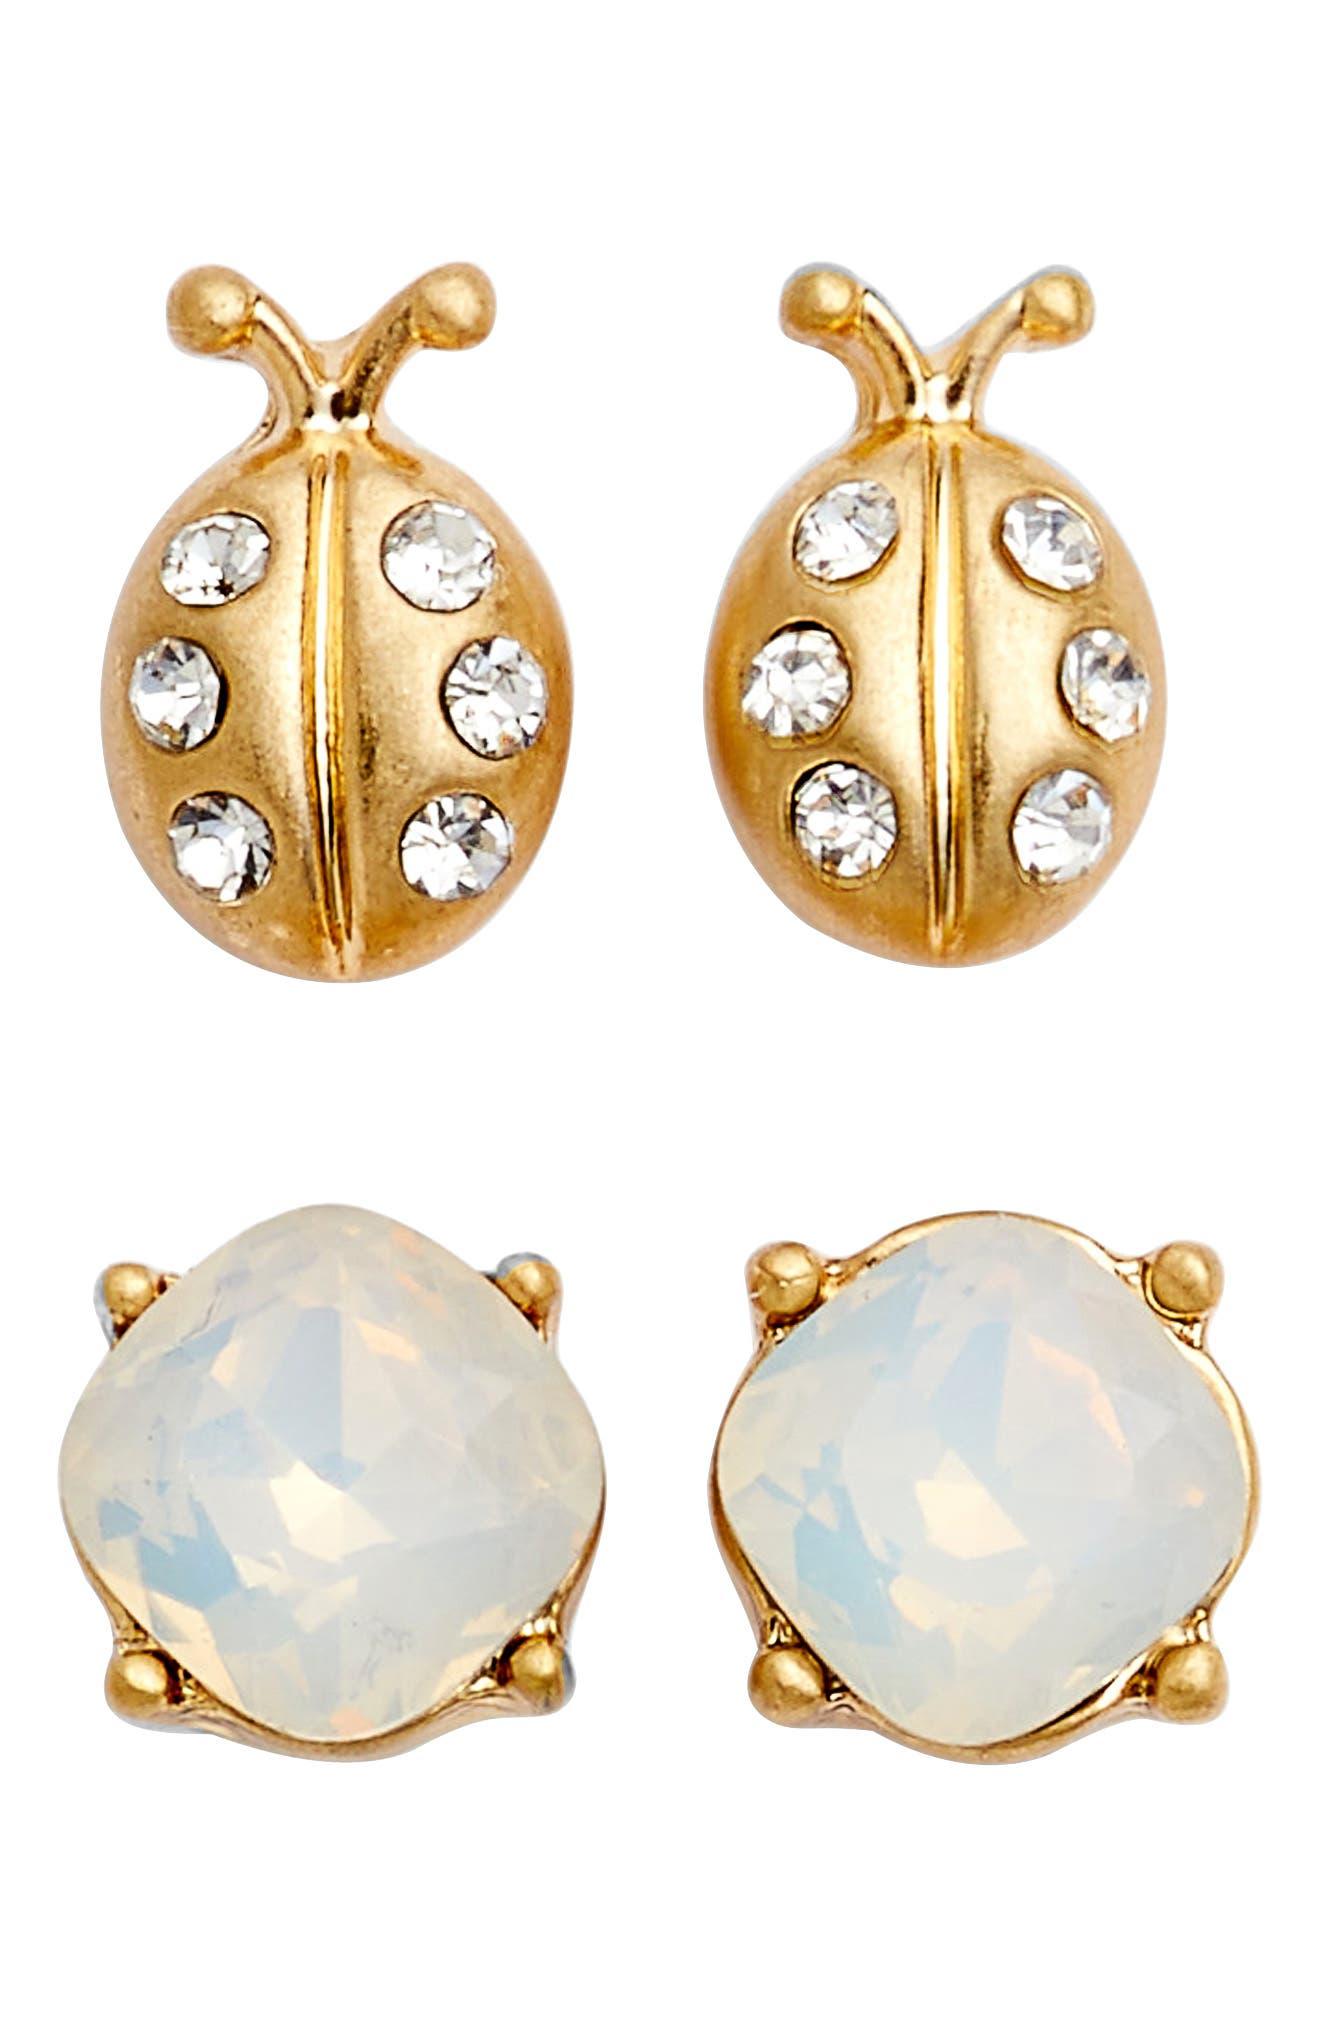 Set of 2 Jeweled Ladybug Earrings,                         Main,                         color, White Opal- Gold